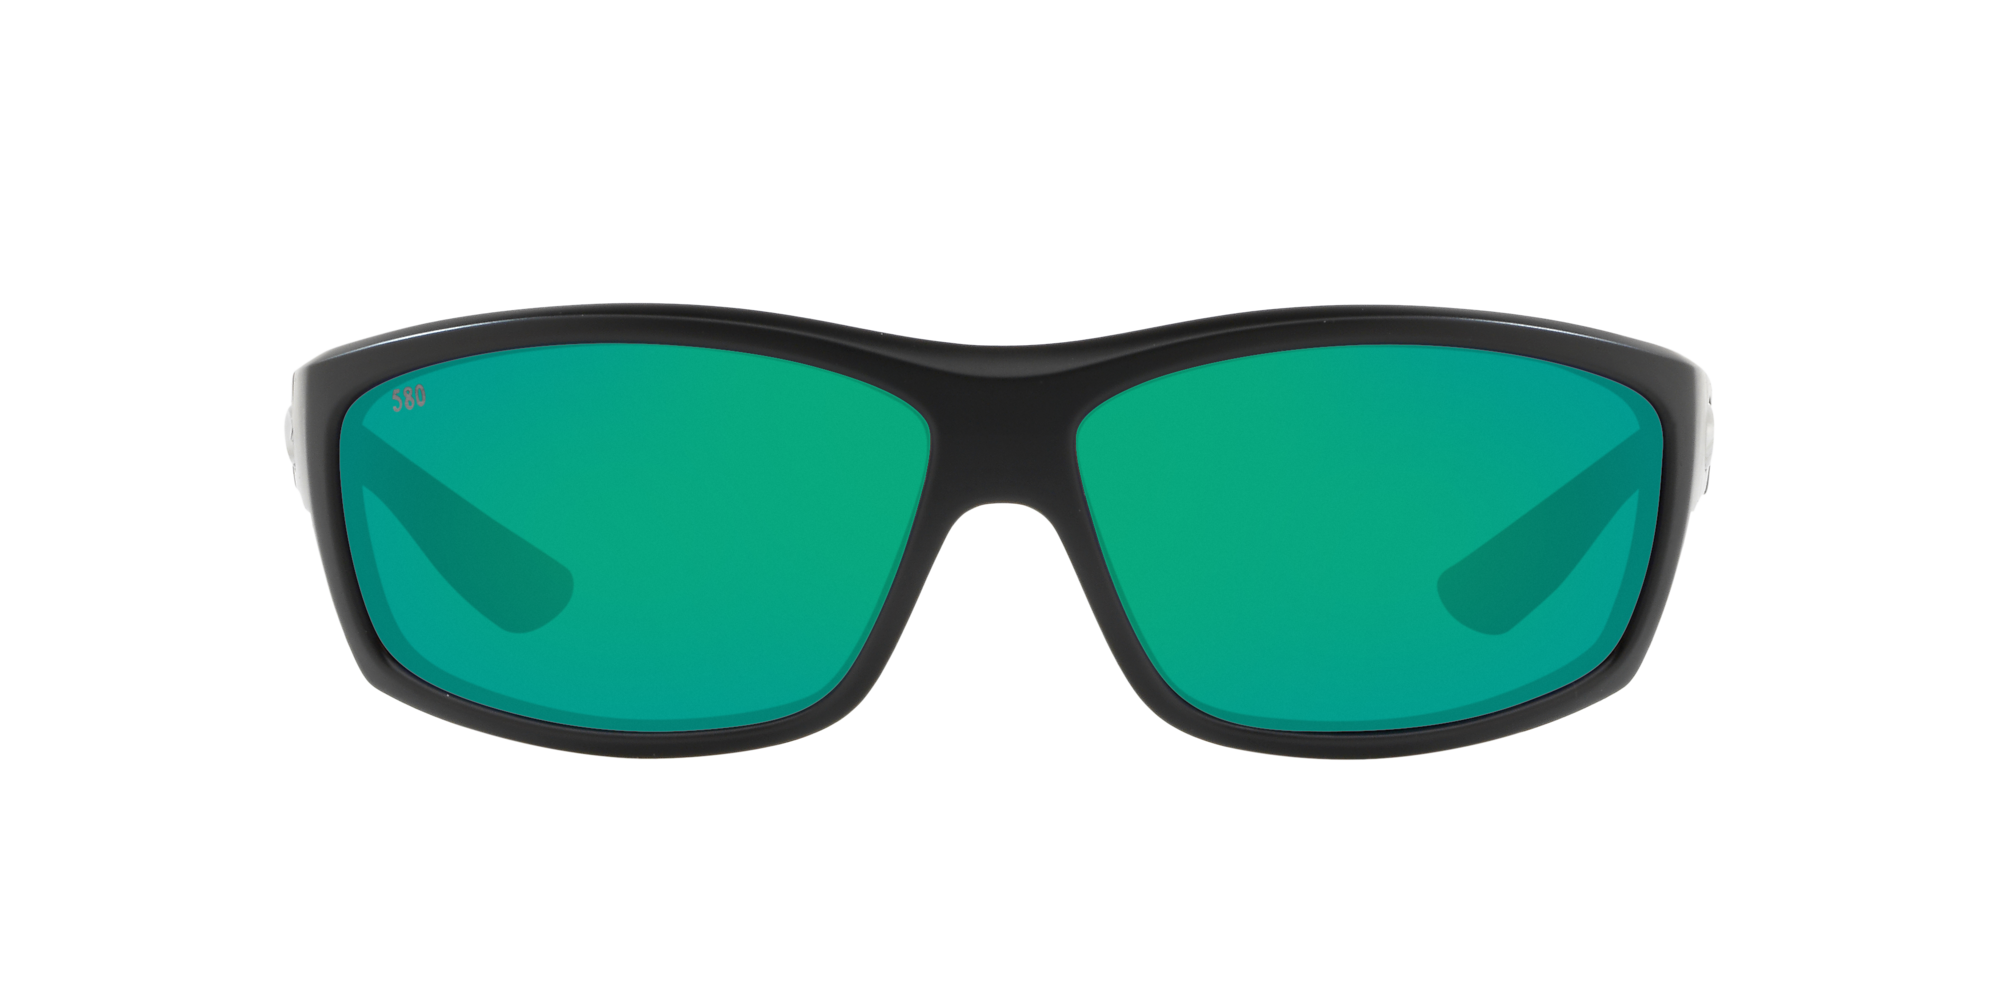 Costa Del Mar SaltBreak Polarized Sunglasses 580P Mt Blackout//Green Mirror Black